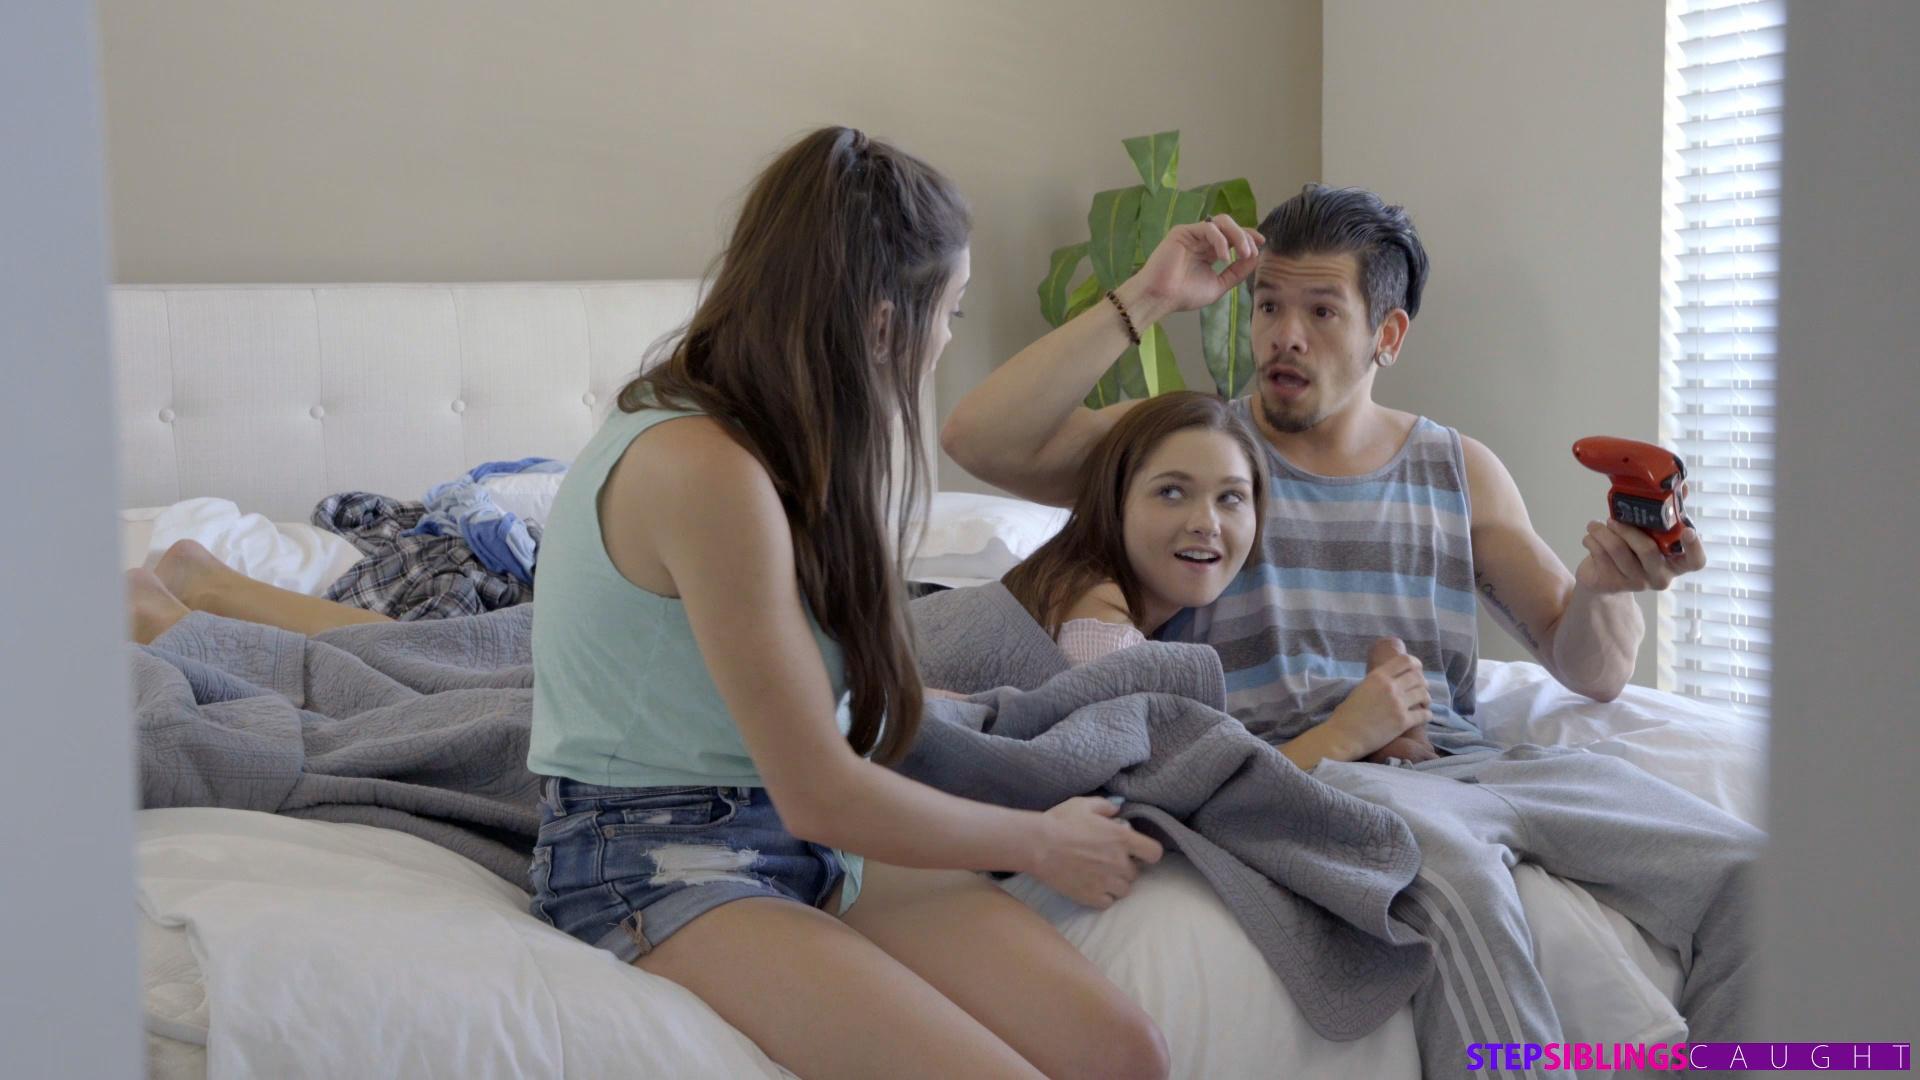 StepSiblingsCaught.com - Ashly Anderson,Zoe Bloom: Game Changer - S8:E3